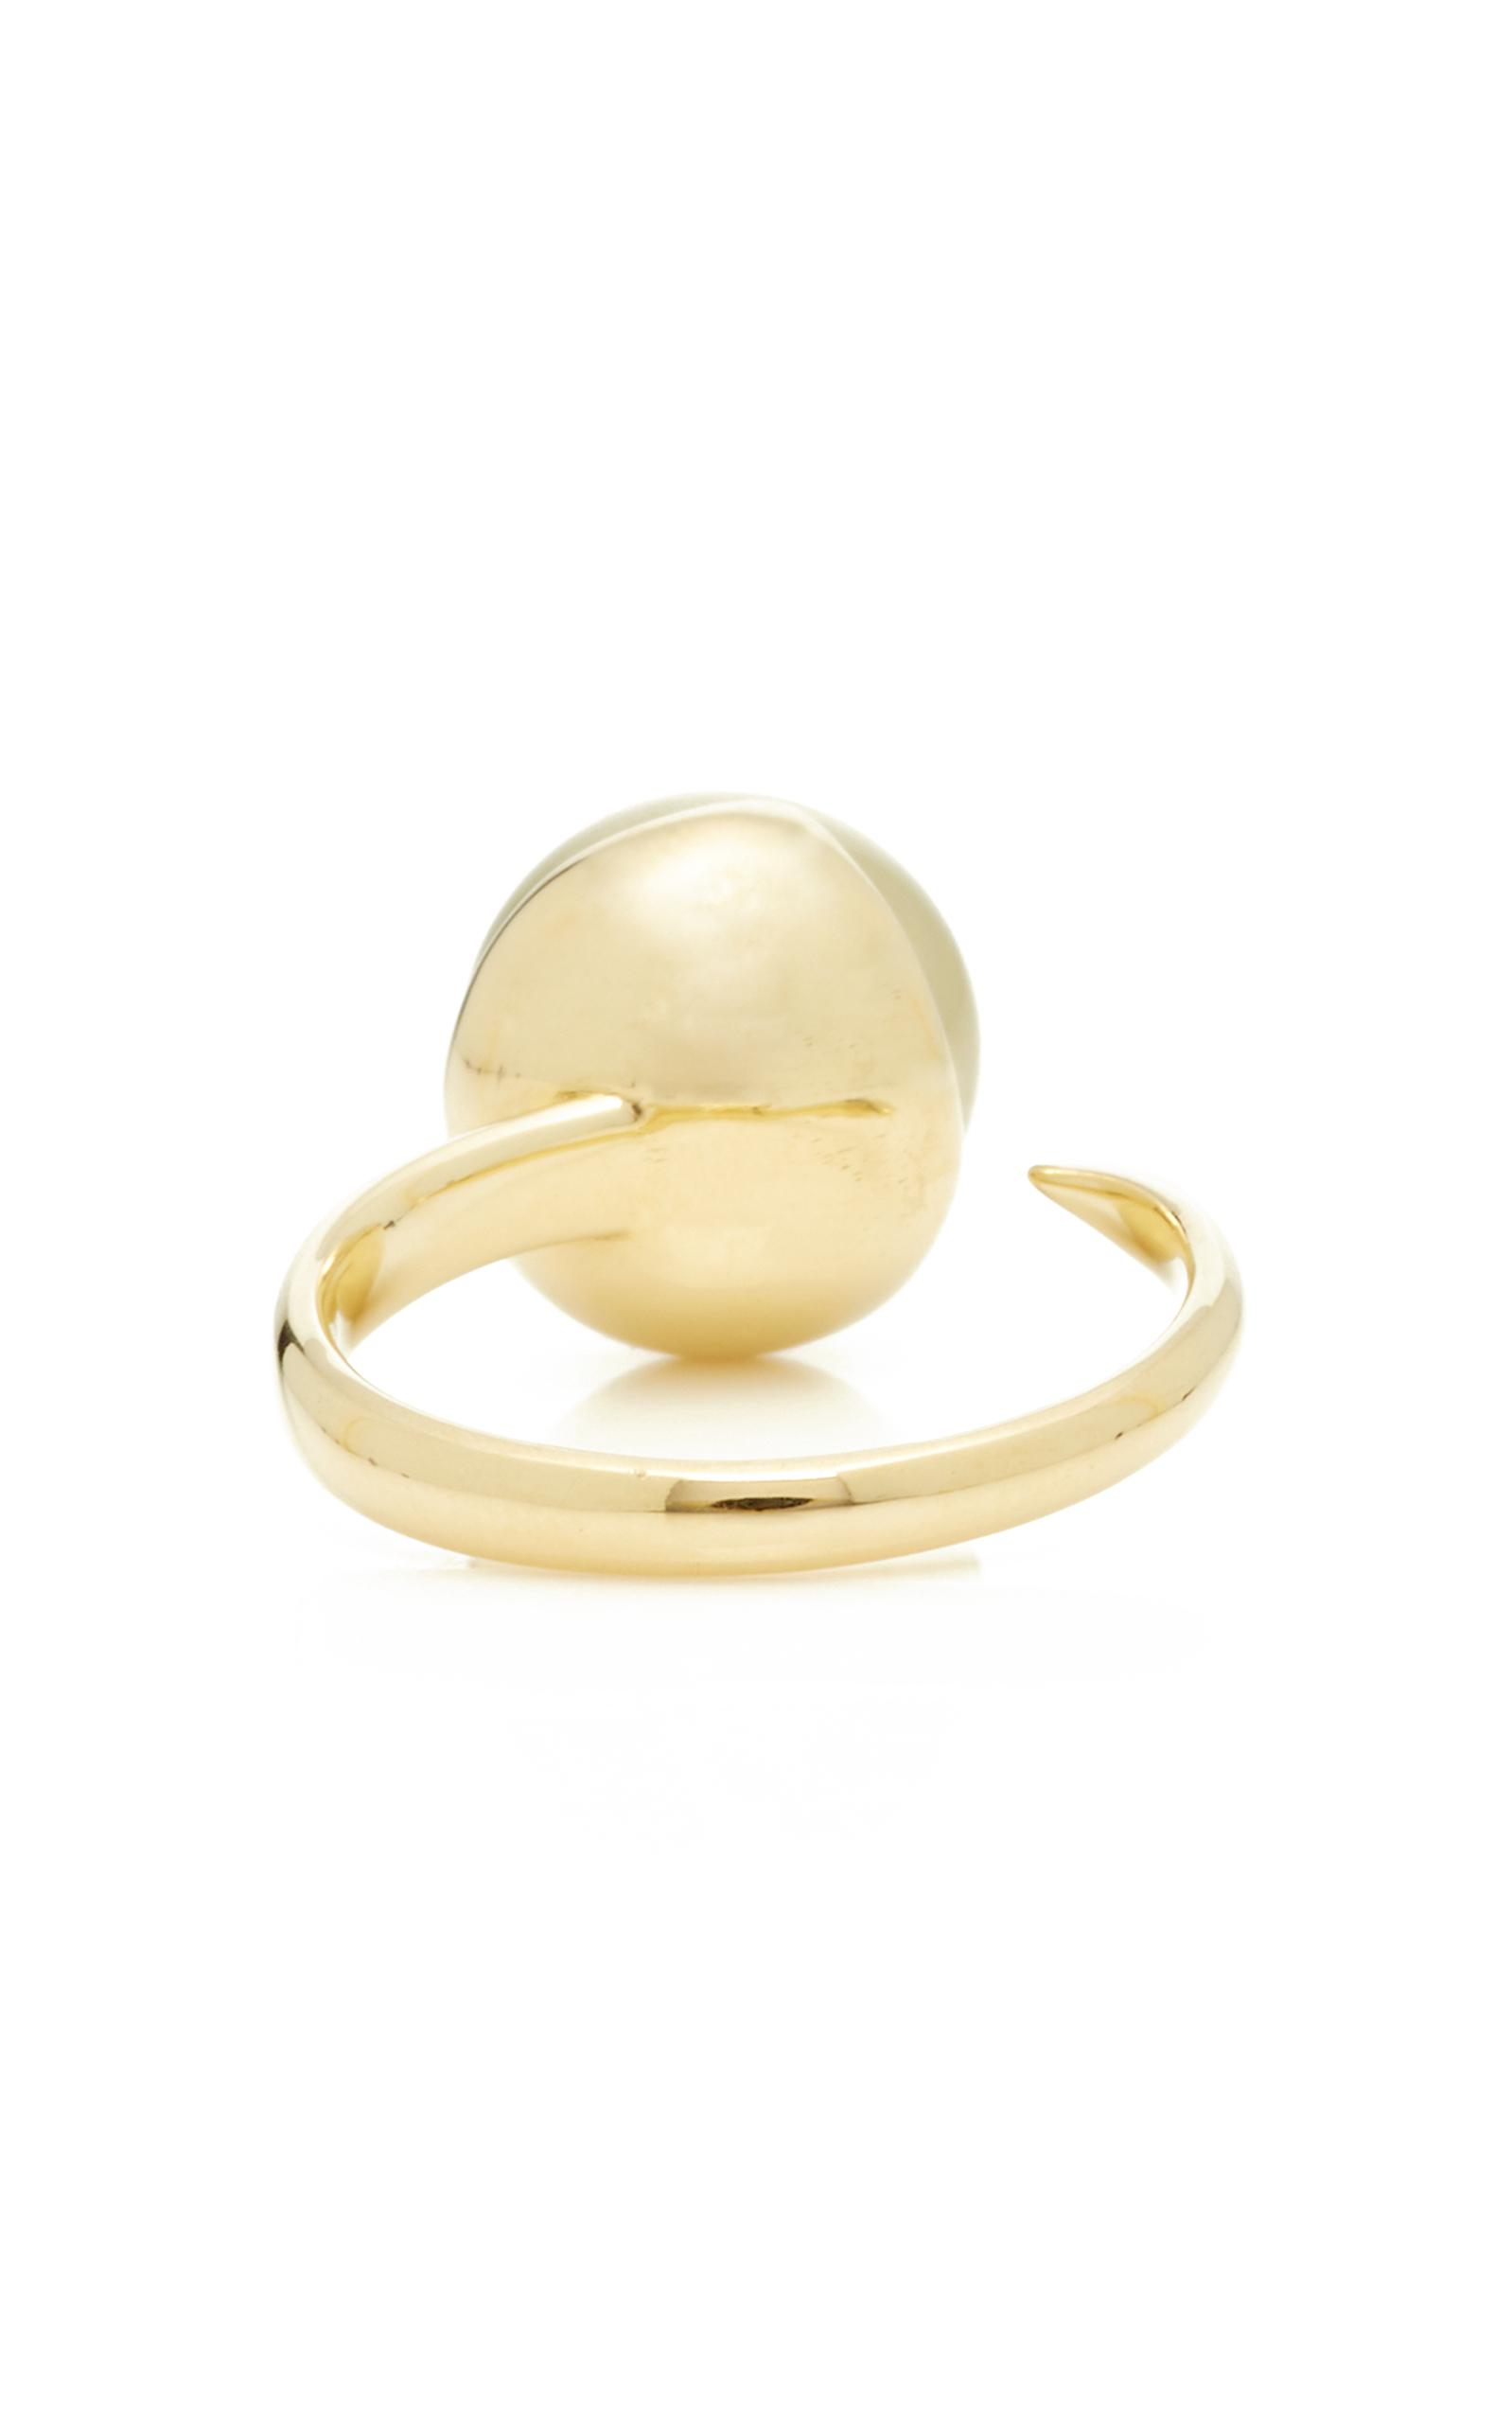 Mizuki Fluid Double Pearl Open Ring in 14K Yellow Gold KxiOP